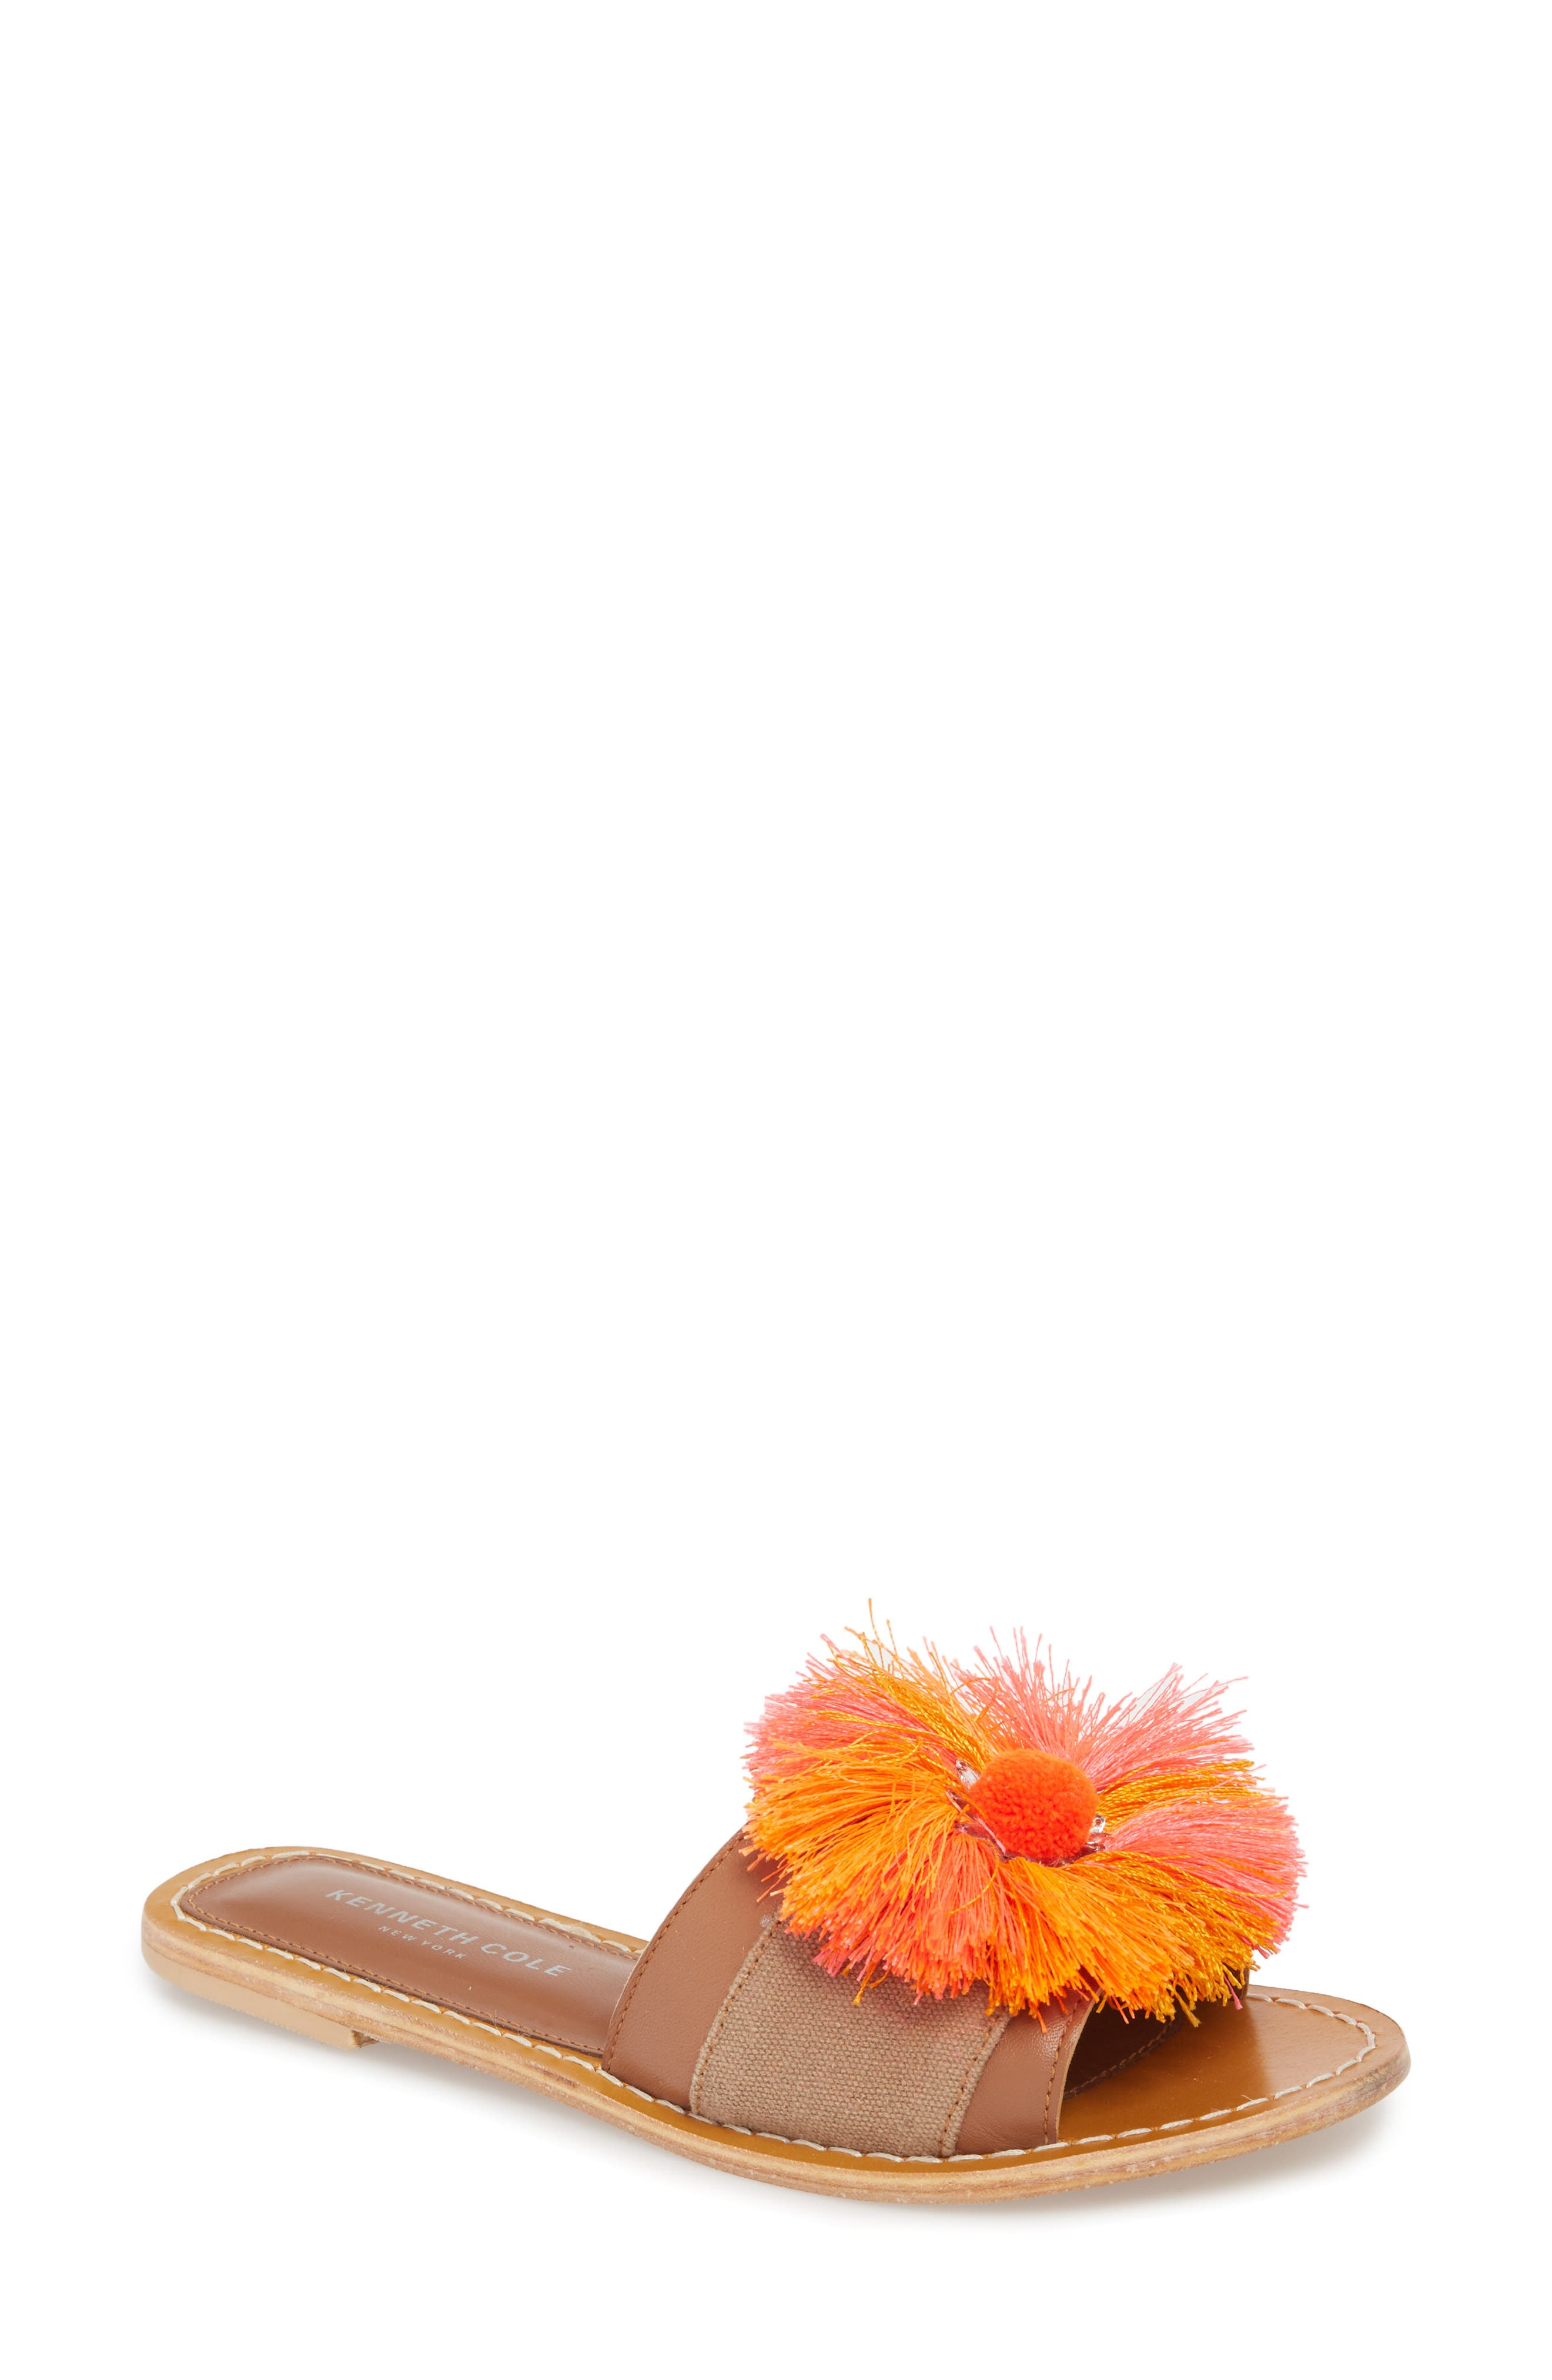 Orton Slide Sandal,                         Main,                         color, Orange Multi Fabric